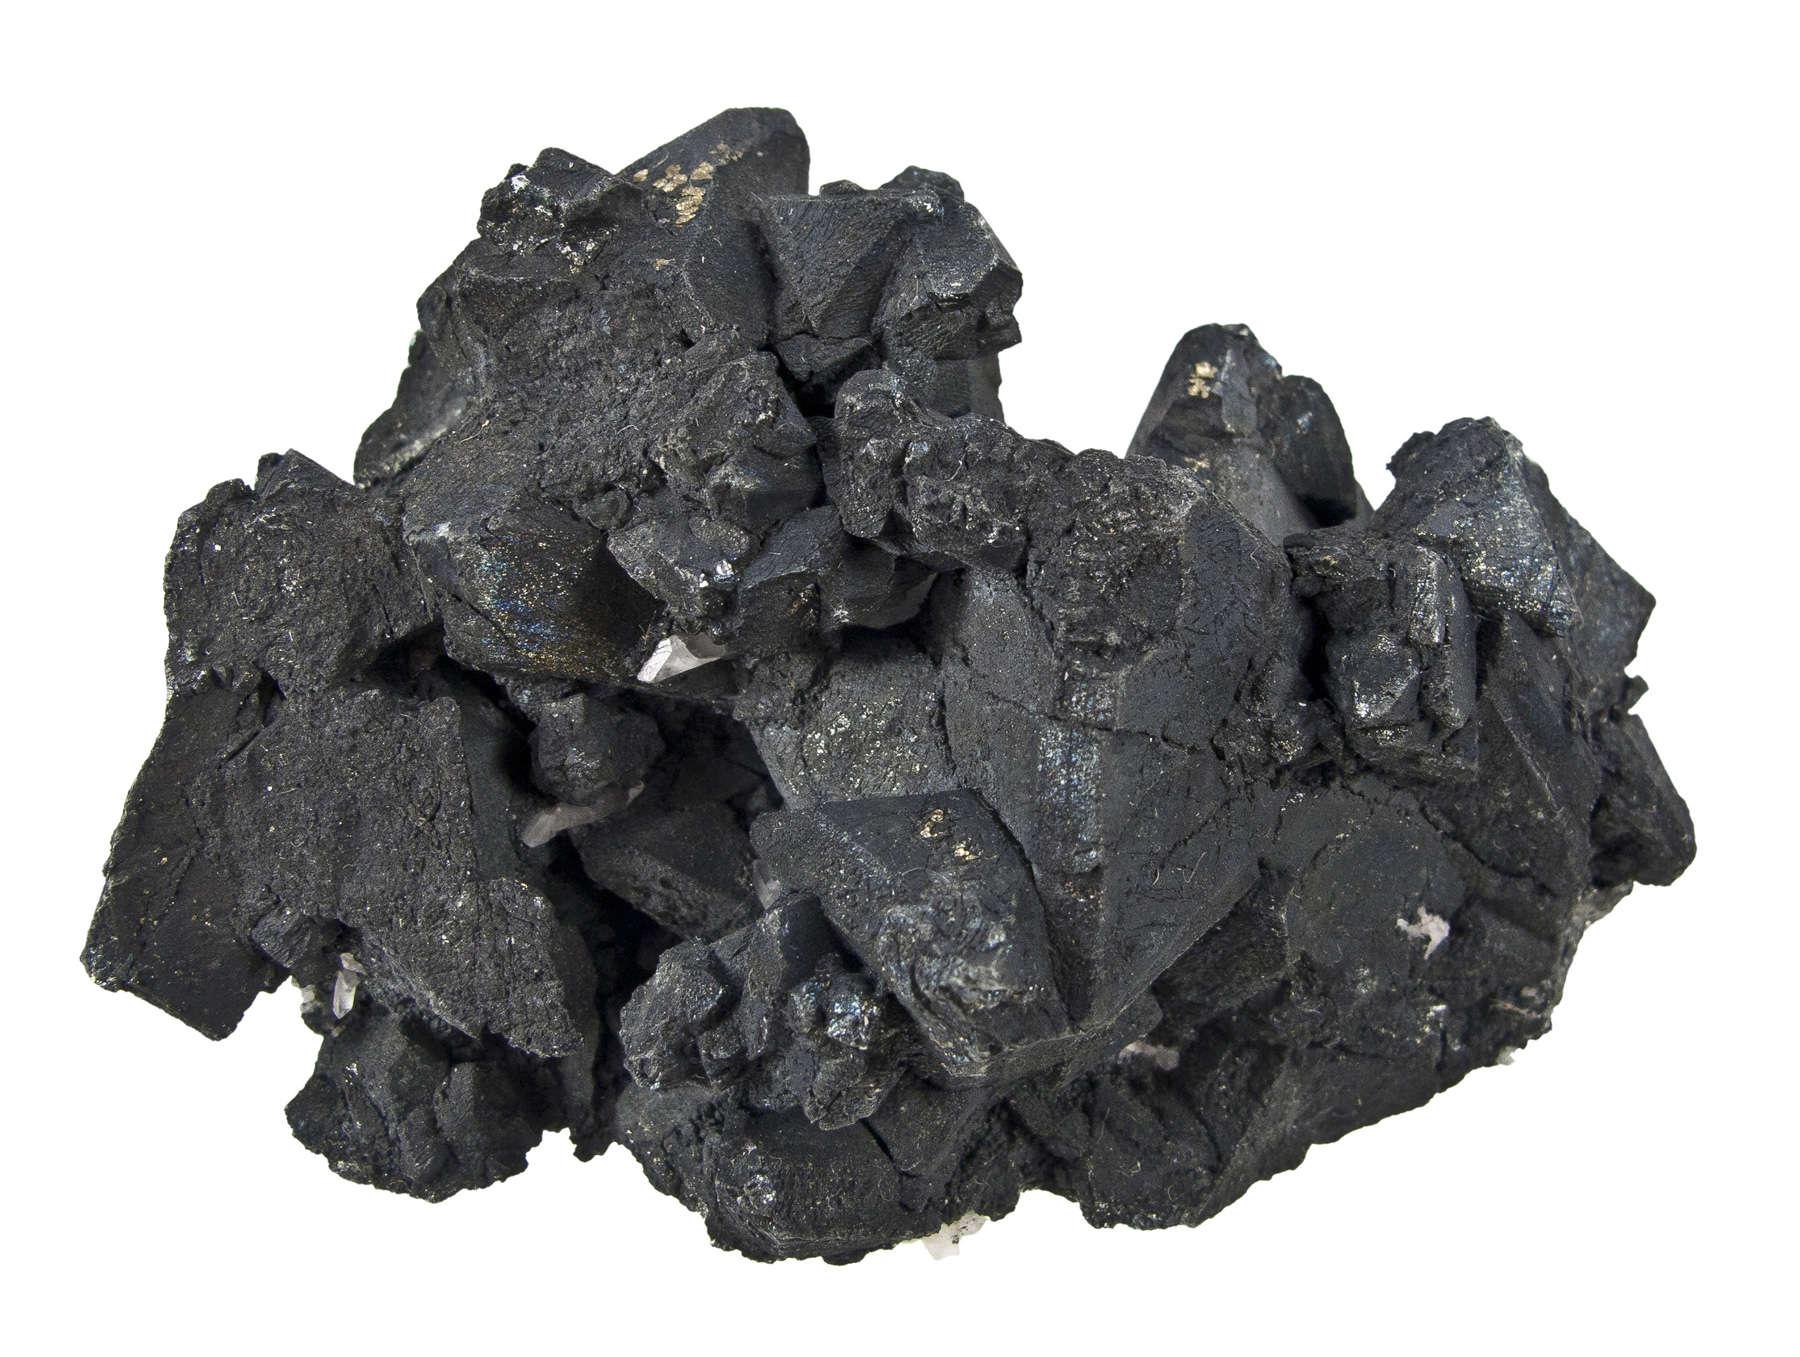 Intergrown octahedrons slightly lustrous black crystals tennantite 2 4